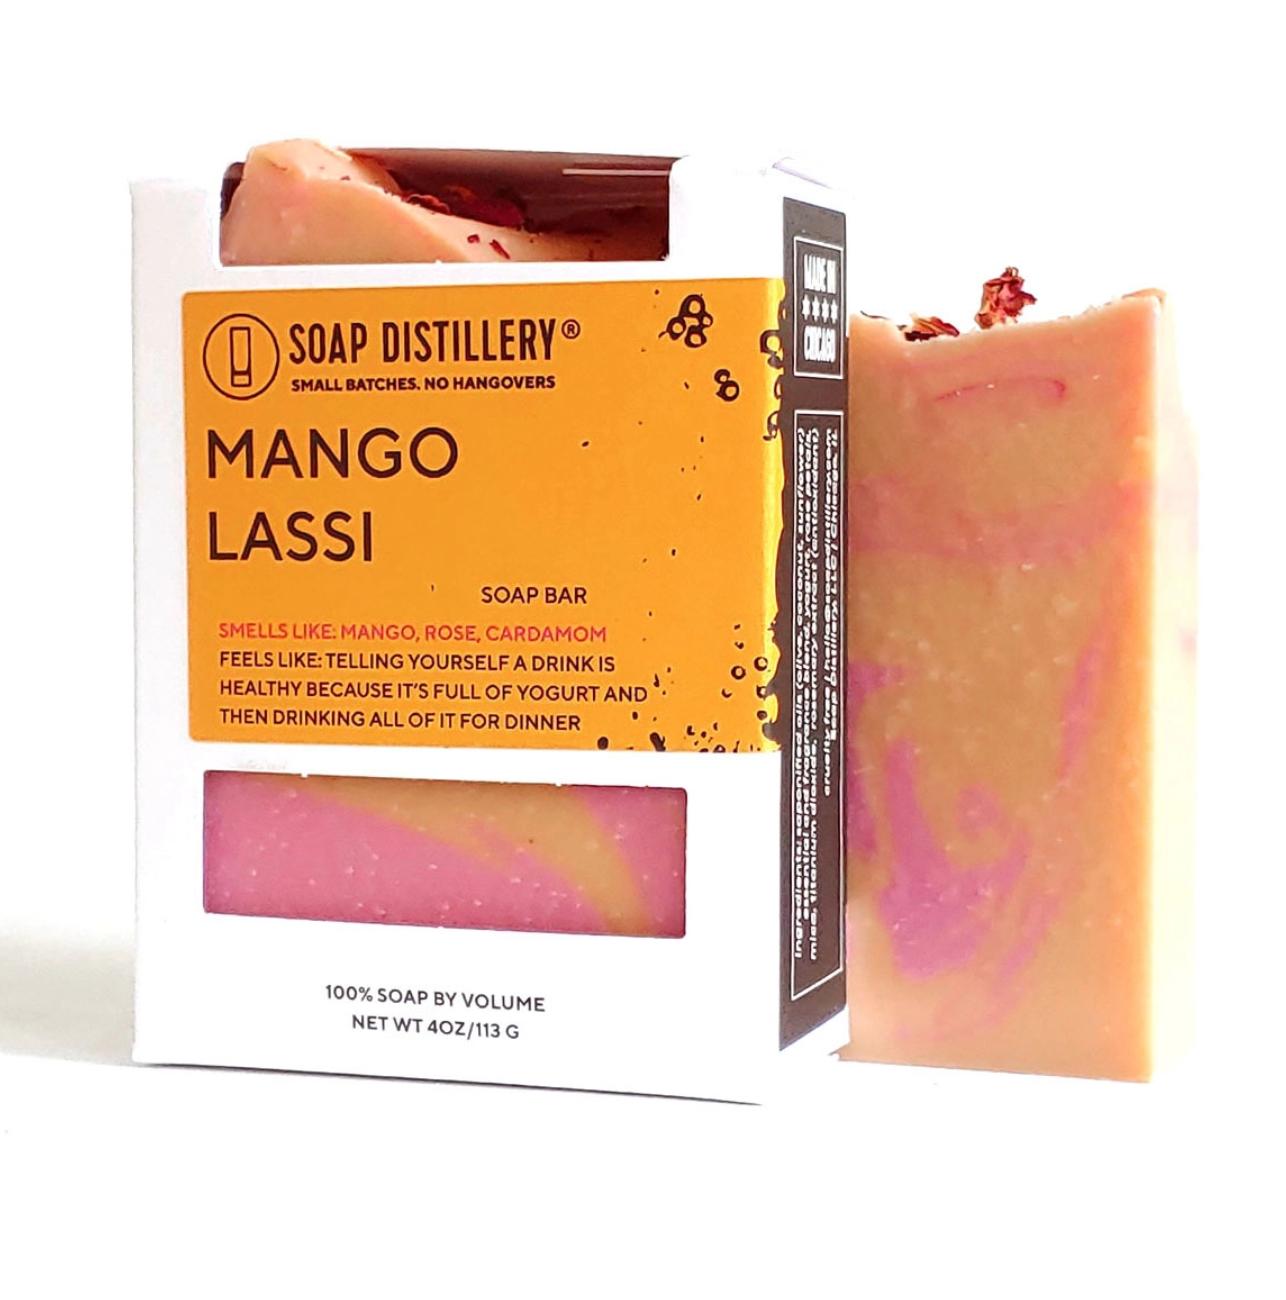 Soap Distillery Mango Lassi Soap Bar